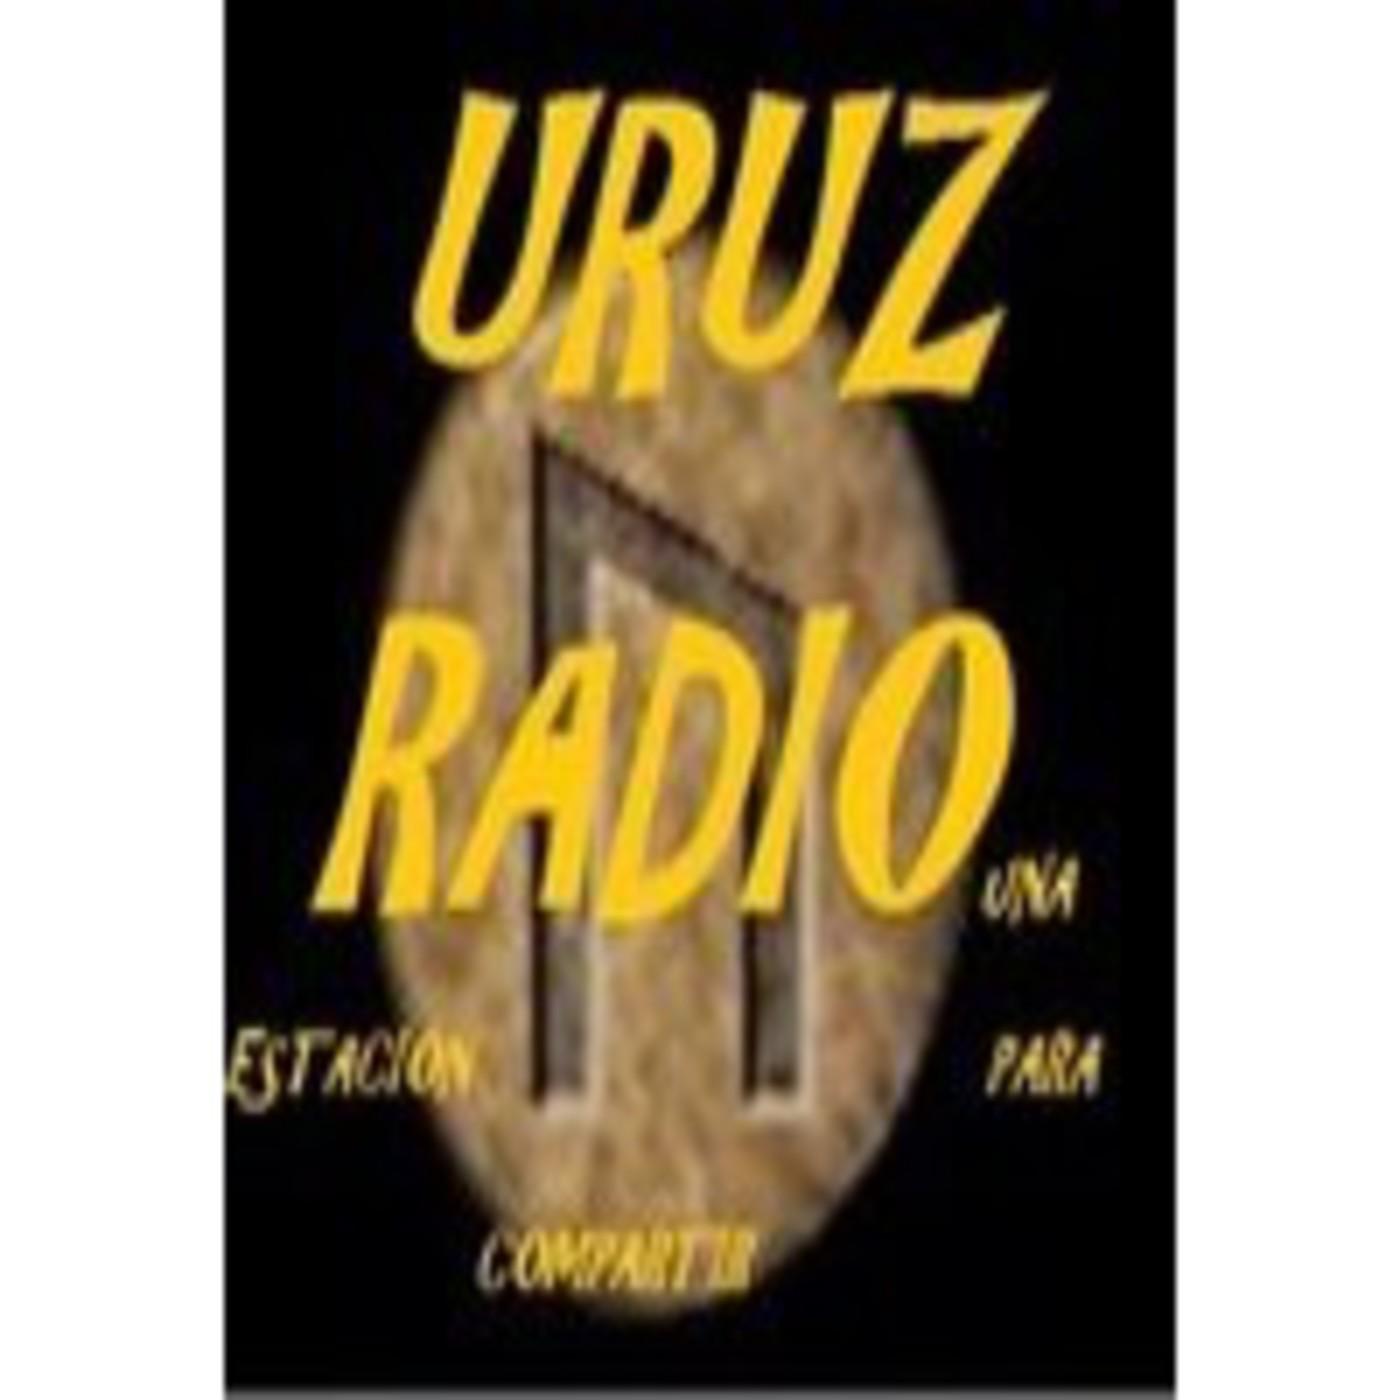 <![CDATA[Uruz Radio]]>